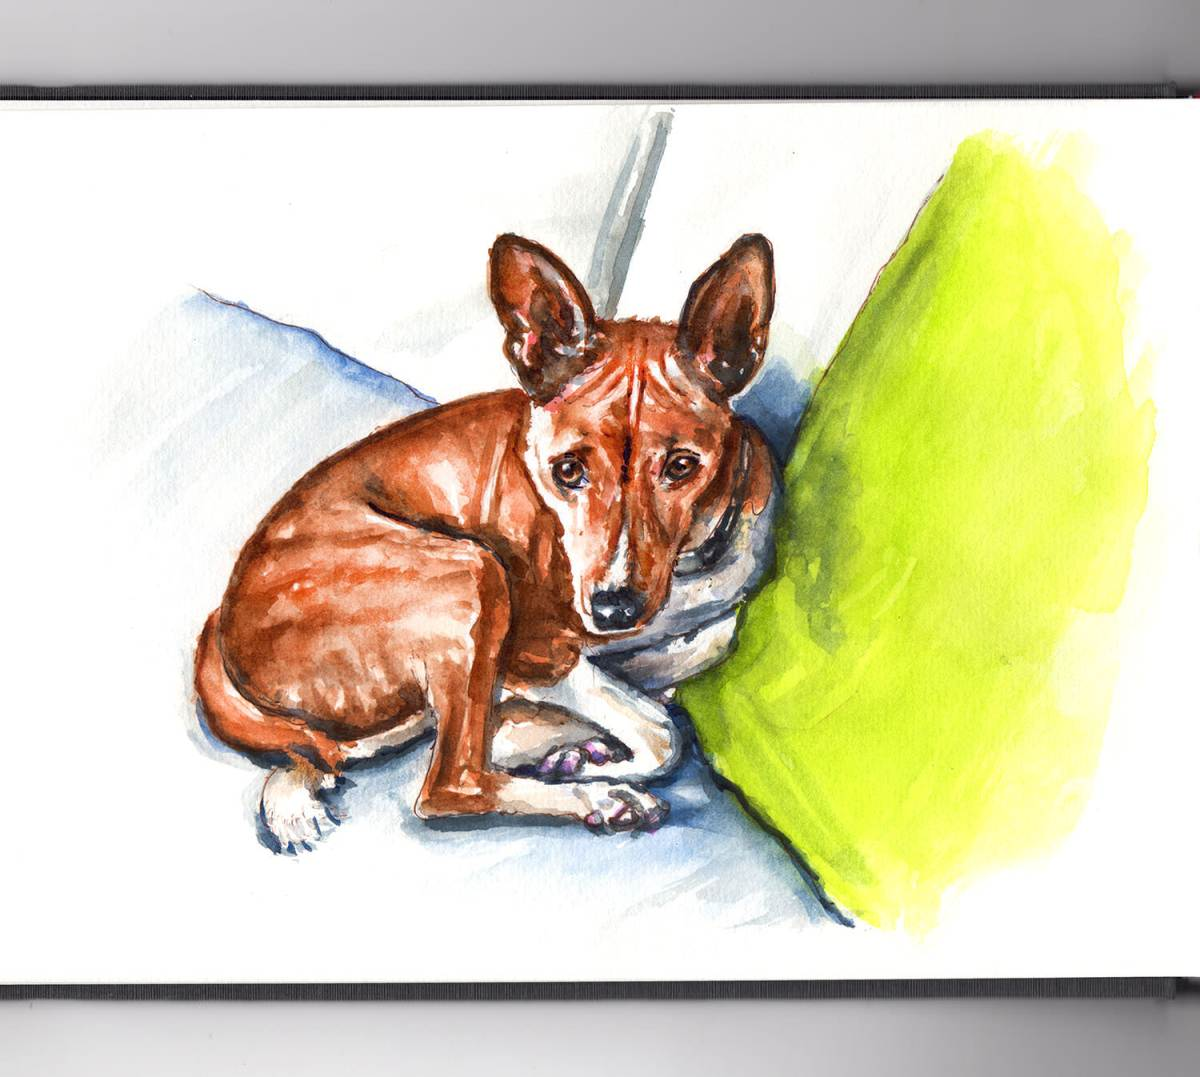 World Watercolor Group - Day 10 - My Favorite Pet - Brindle Basenji - Doodlewash